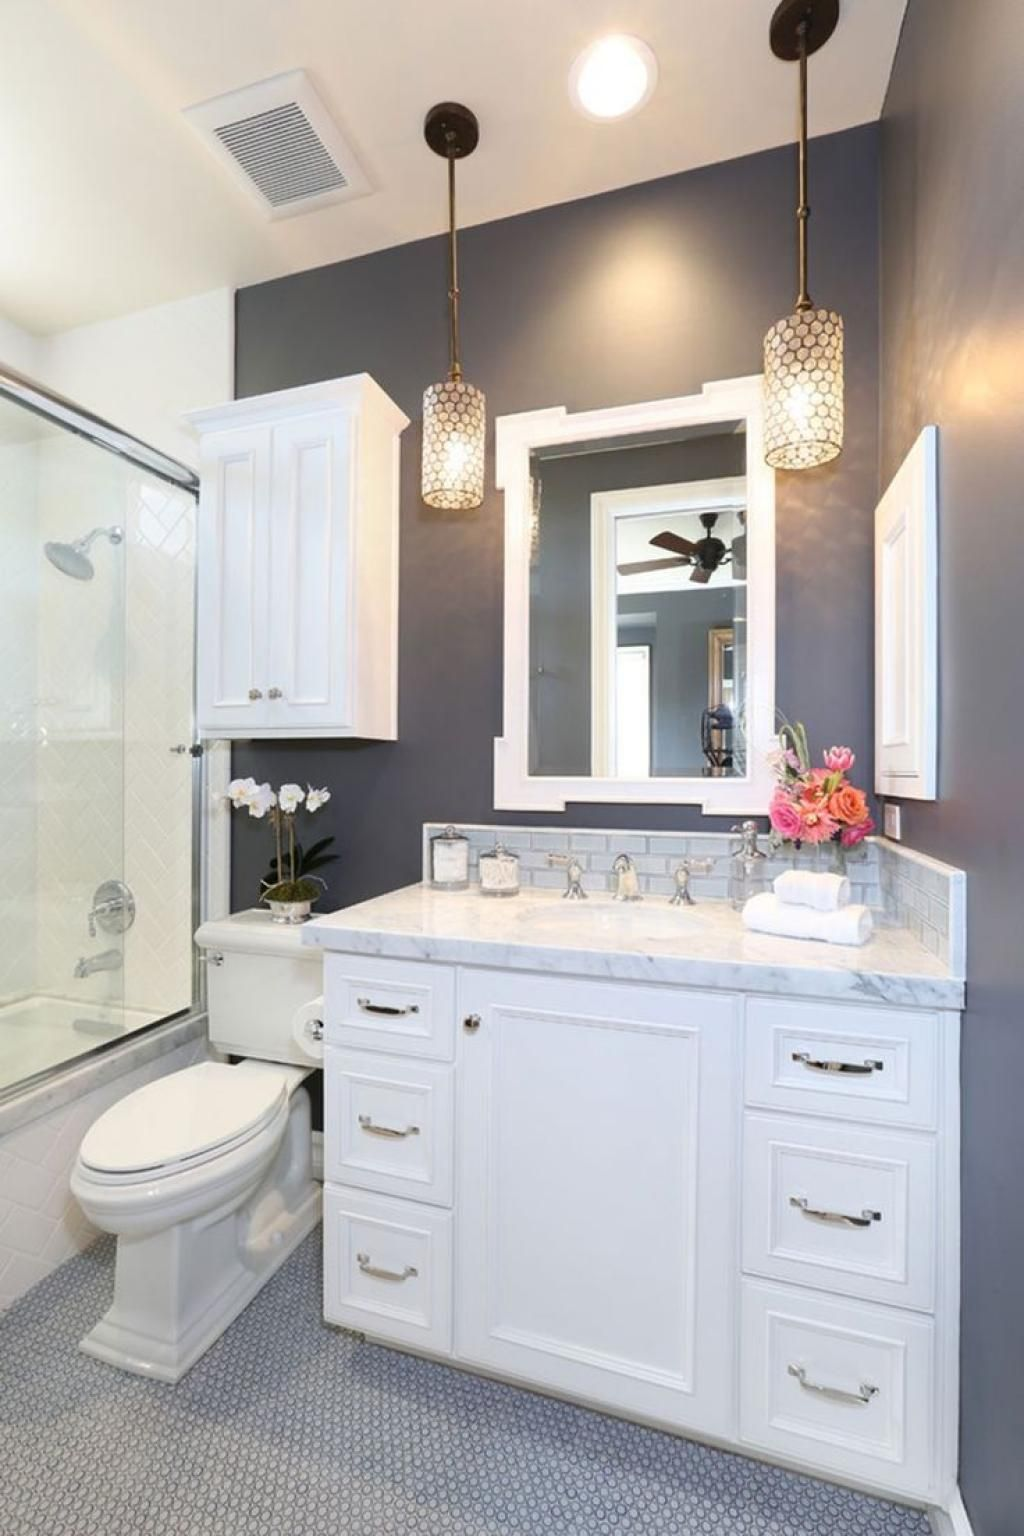 15 Small White Beautiful Bathroom Remodel Ideas  Tiny Bathrooms Awesome Small Beautiful Bathrooms Review